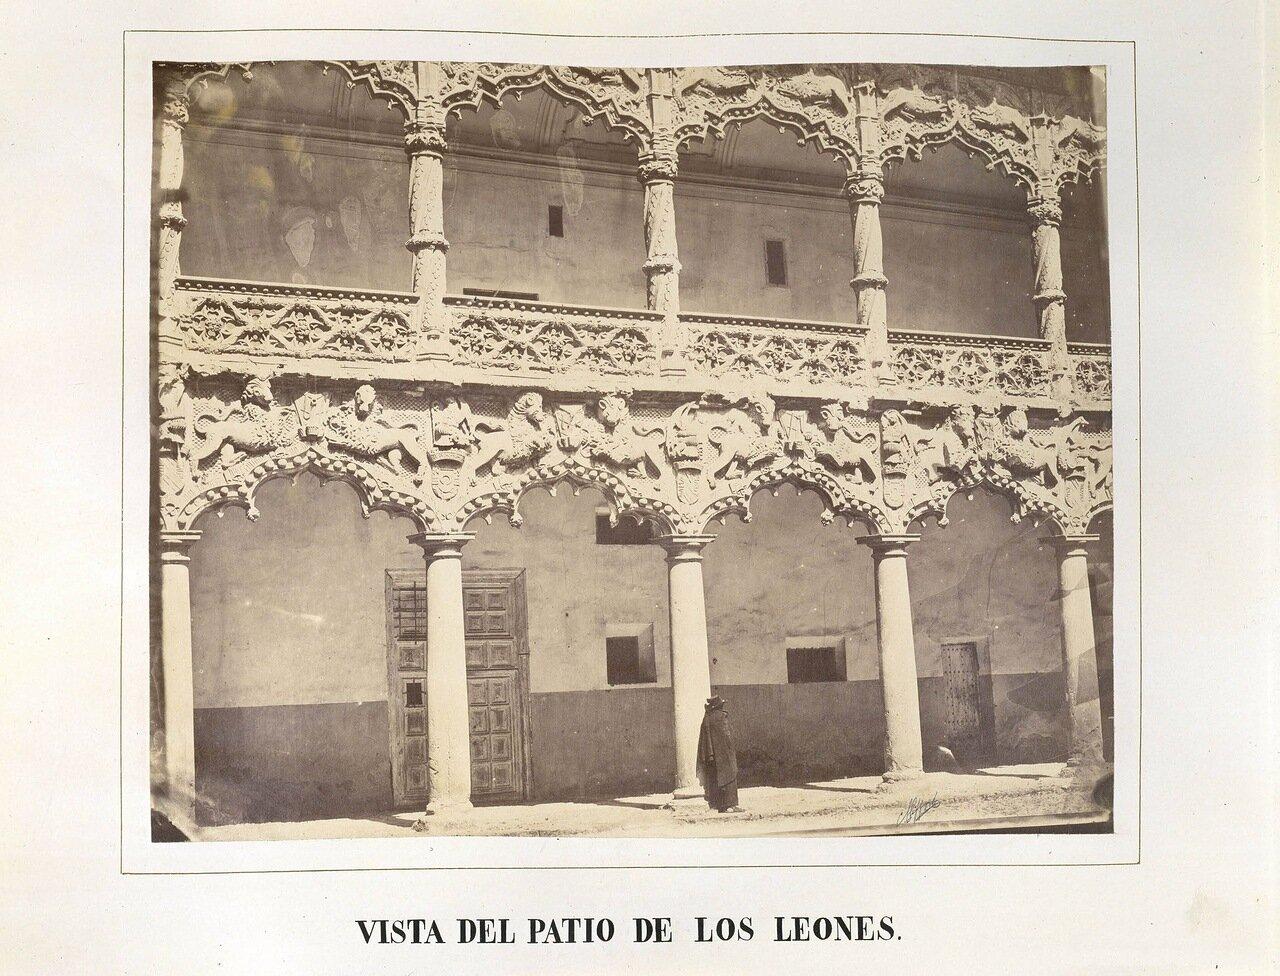 Дворец львов. Гранада